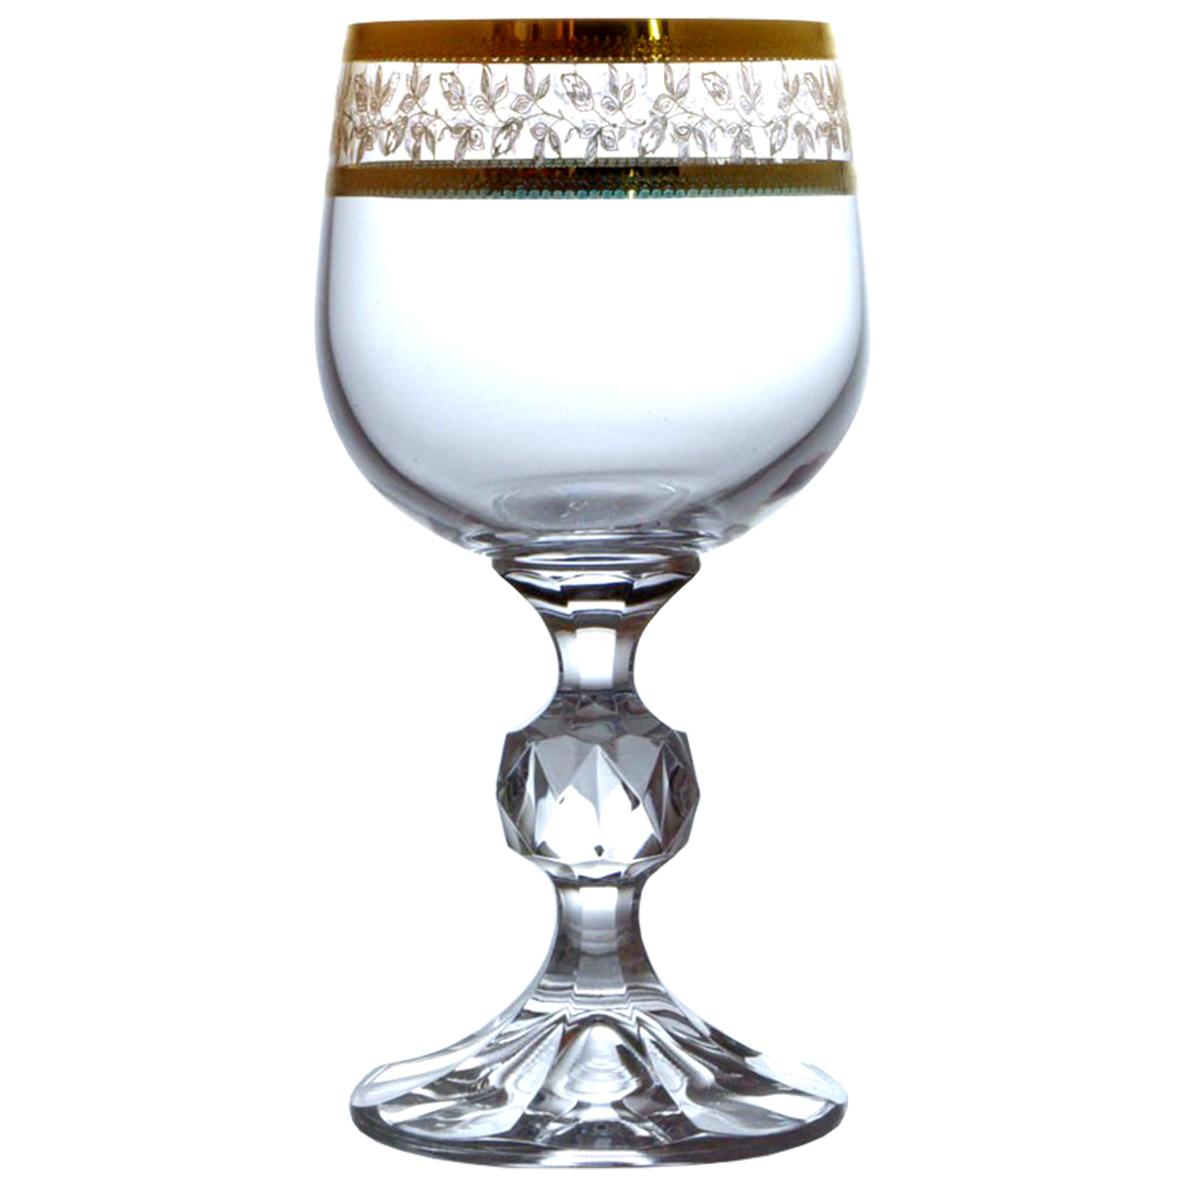 Набор бокалов для вина Bohemia Crystal Клаудия, 230 мл, 6 шт. 40149/43081/230 набор бокалов для вина bohemia crystal анжела 185 мл 6 шт page 3